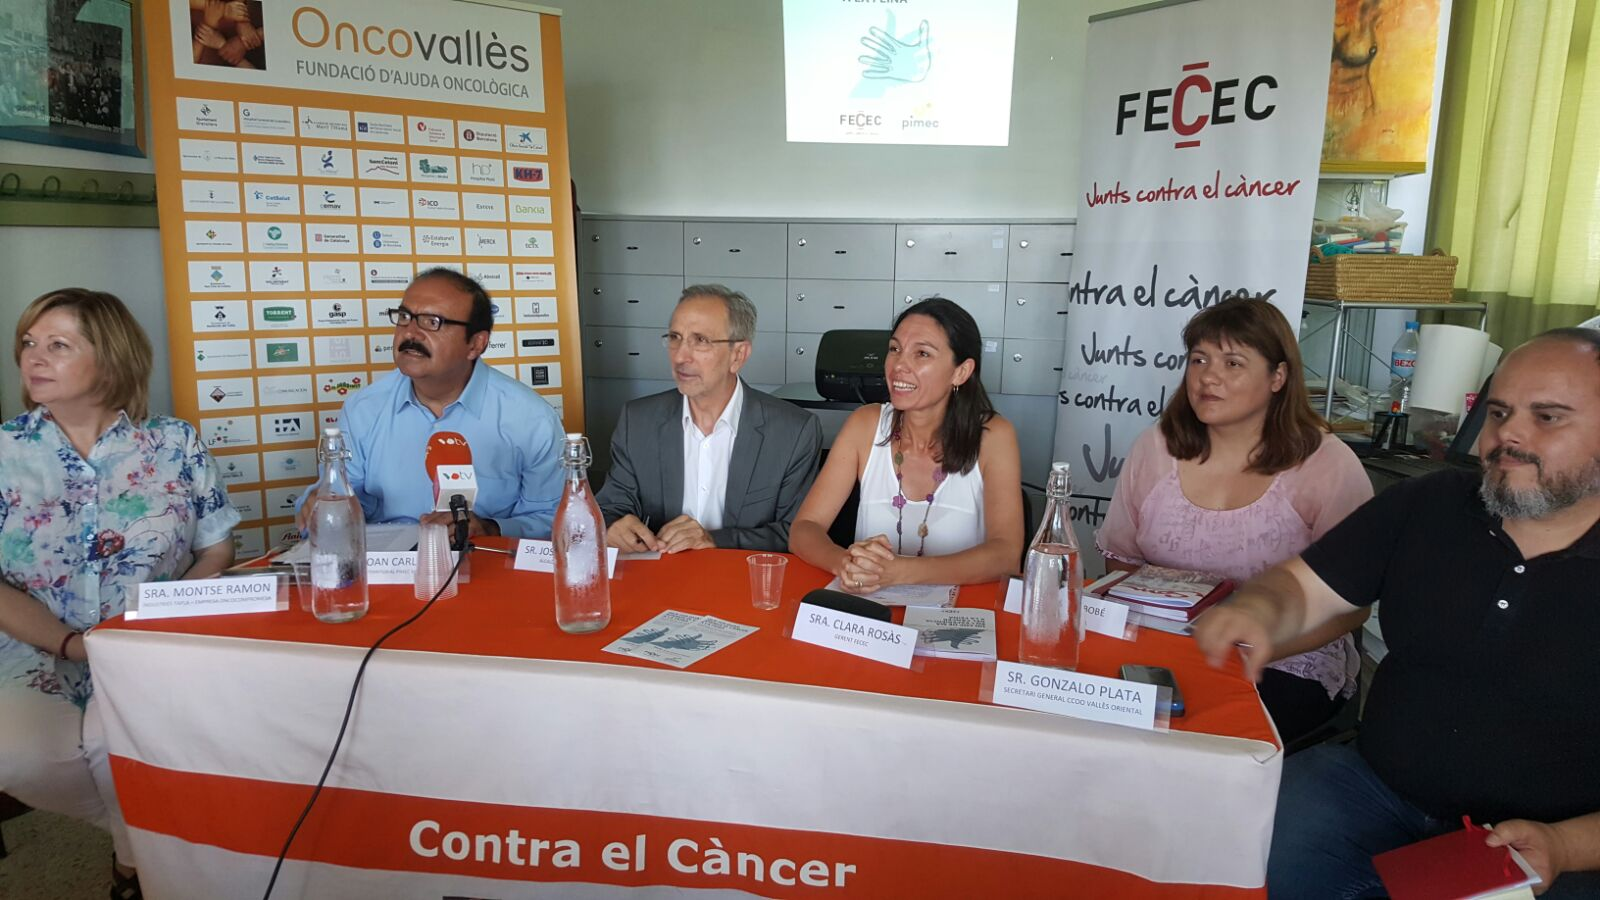 cancer-feina-oncovalles-fecec-pimec-grancentre-granollers-1